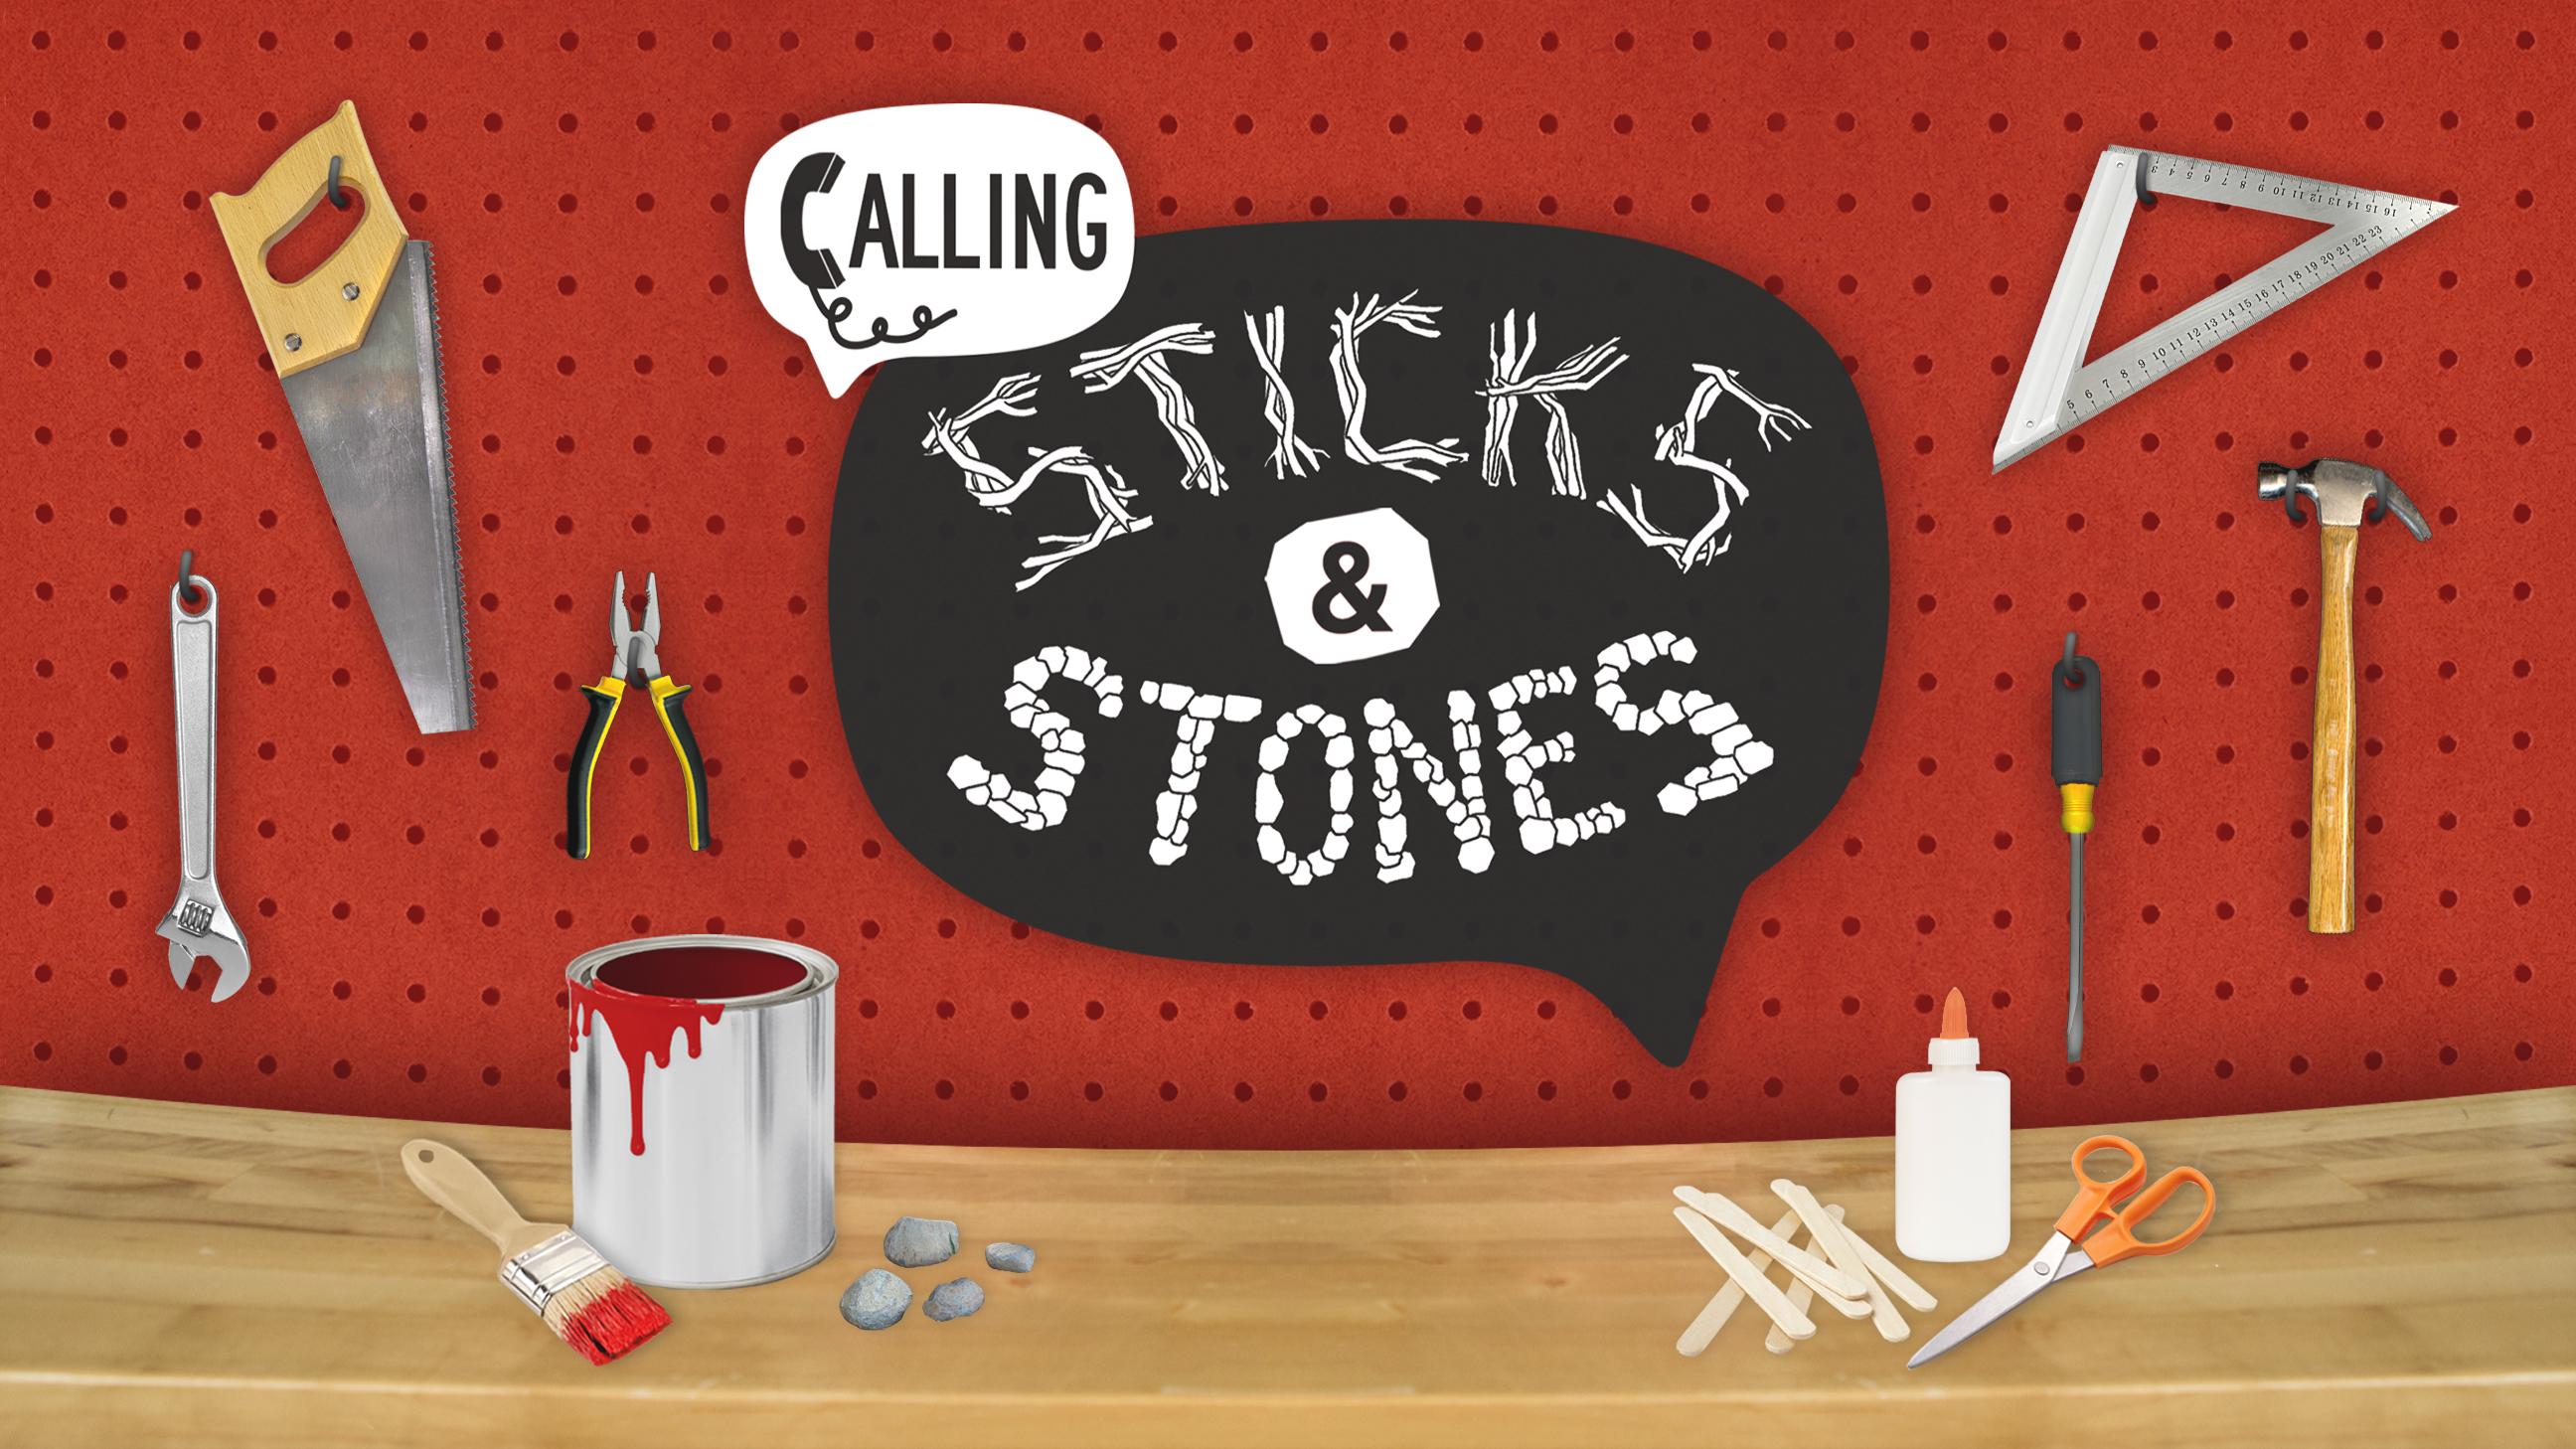 Calling sticks and stones